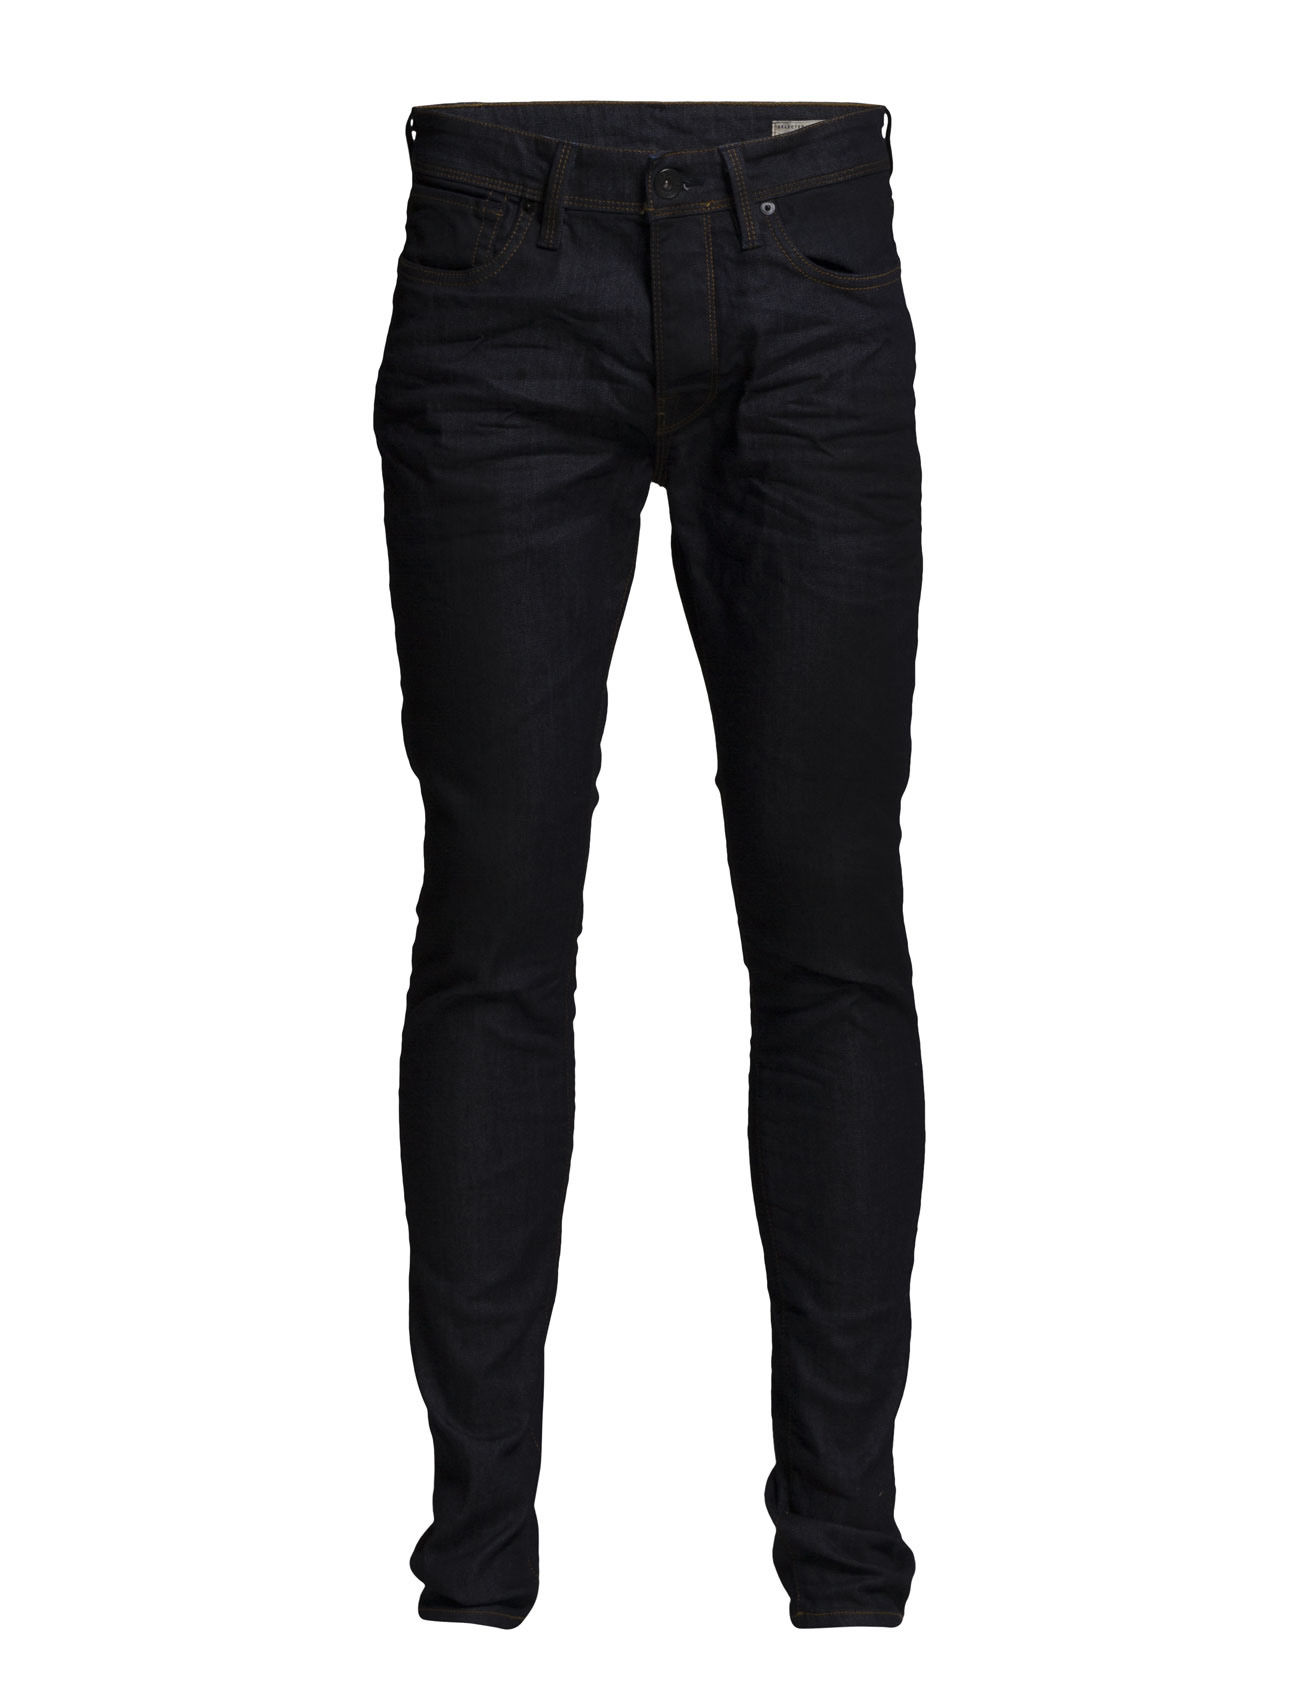 One Roy 1367 Jeans Ix